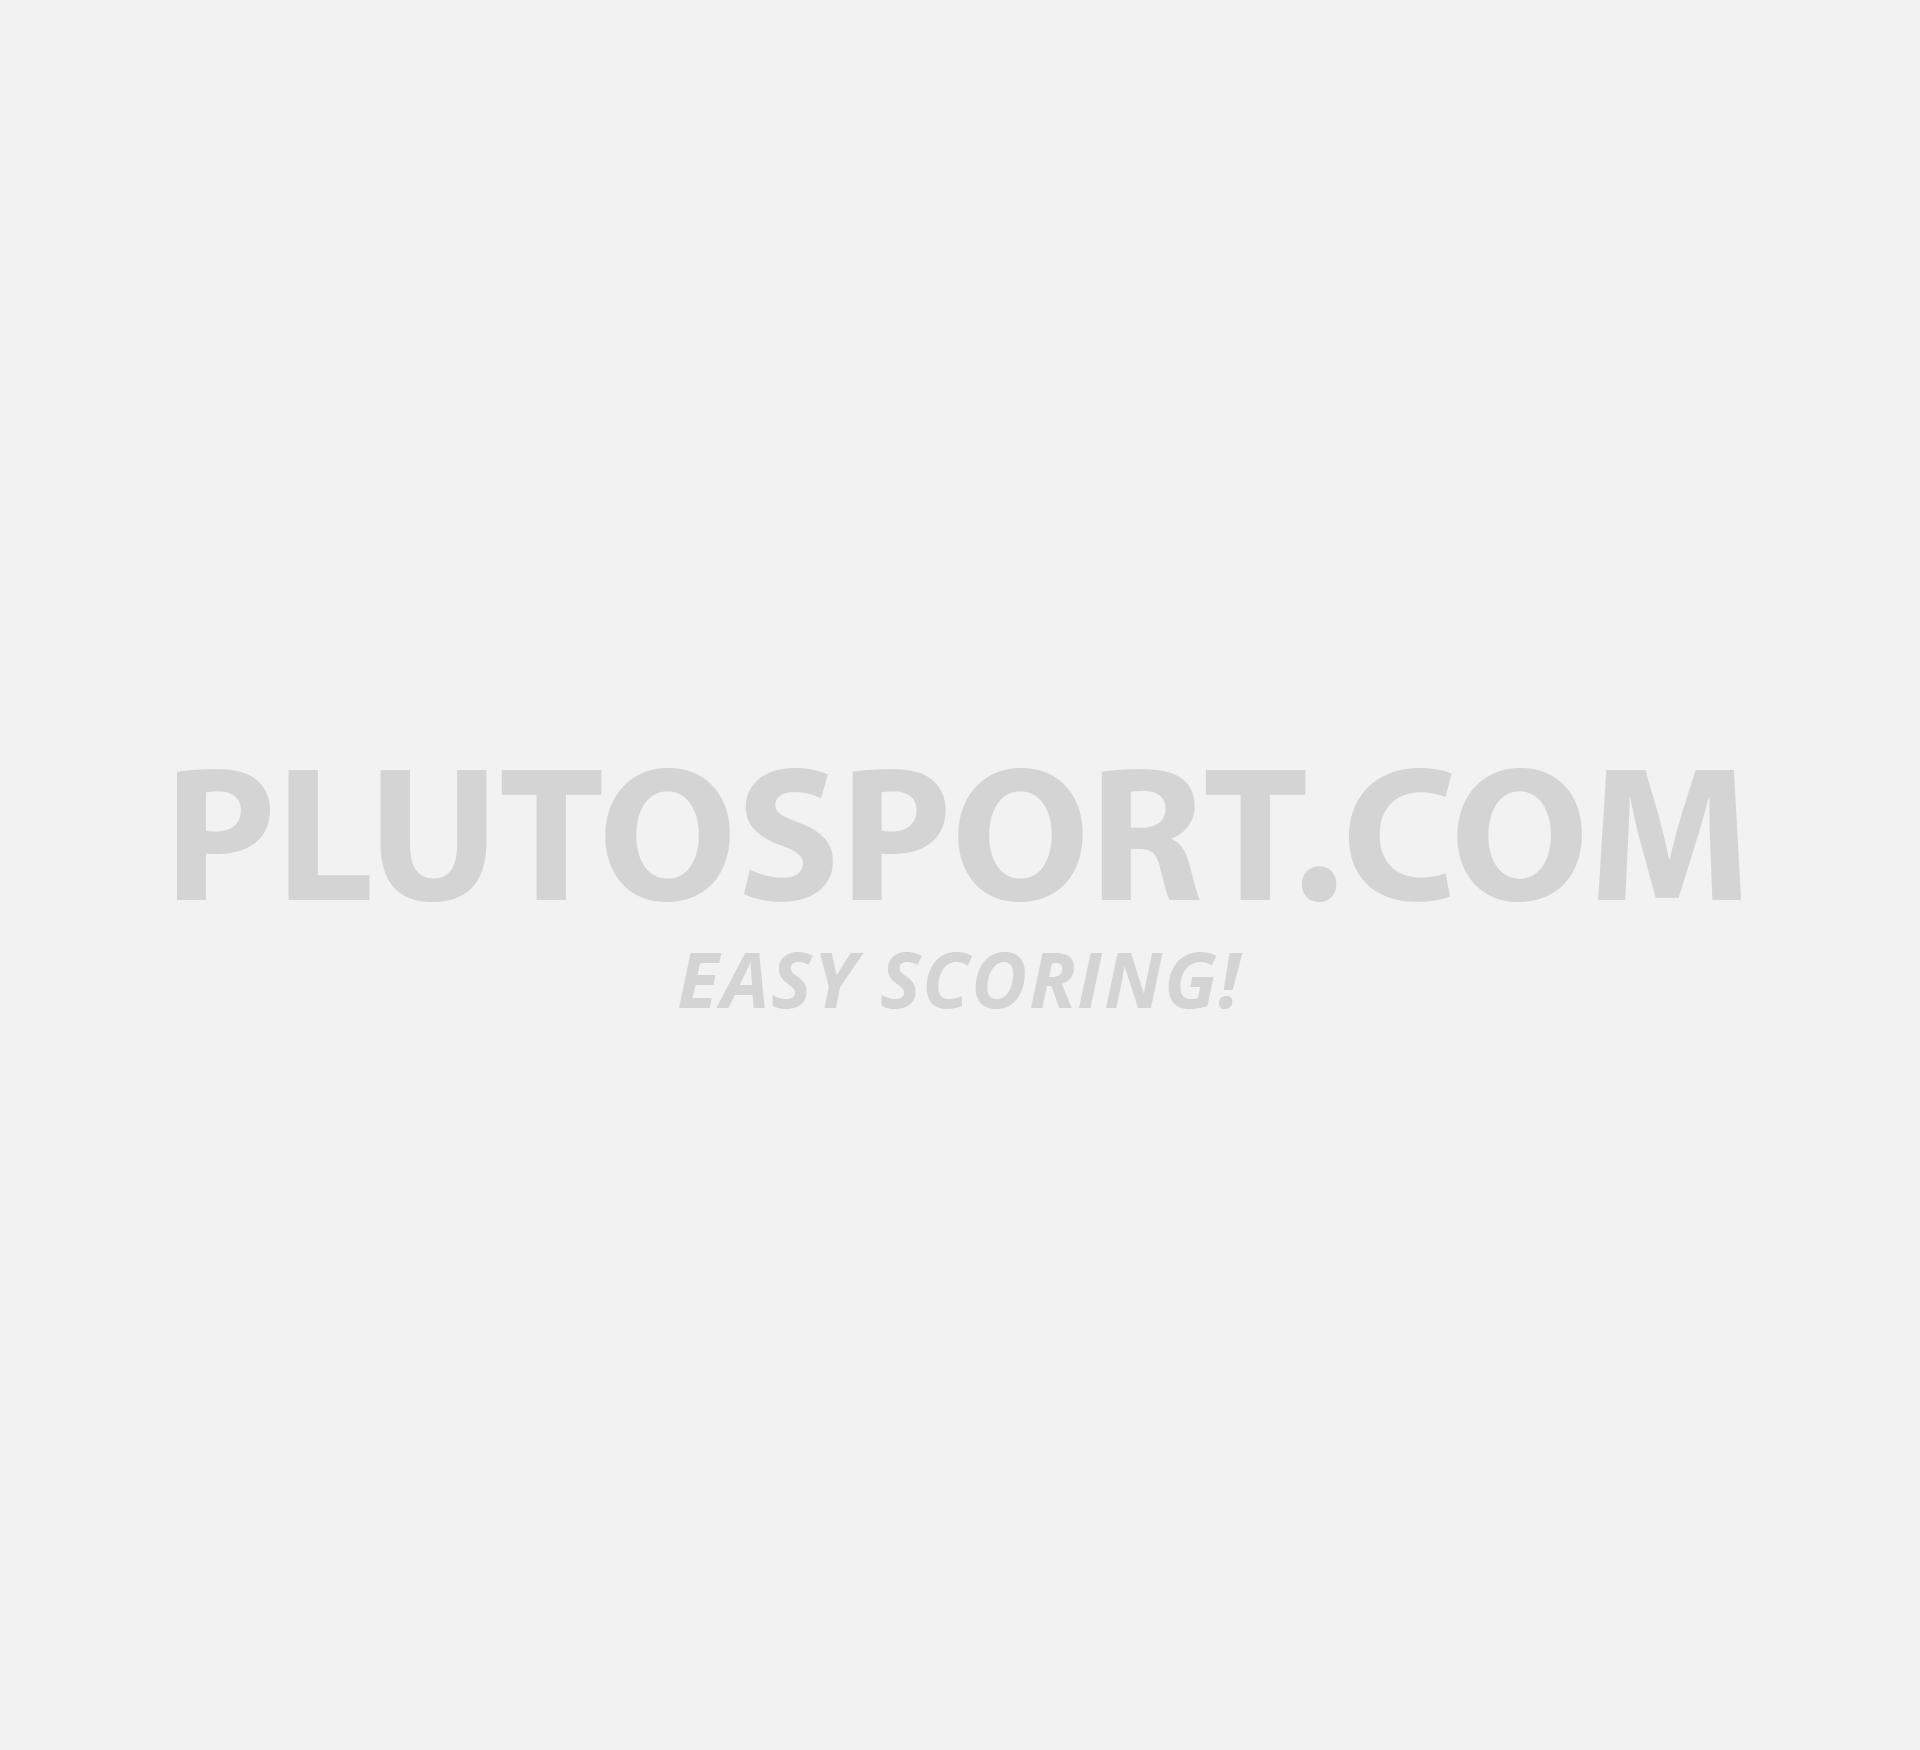 Nike Benassi JDI - Bath Slippers - Flip Flops - Shoes - Lifestyle - Women   Plutosport